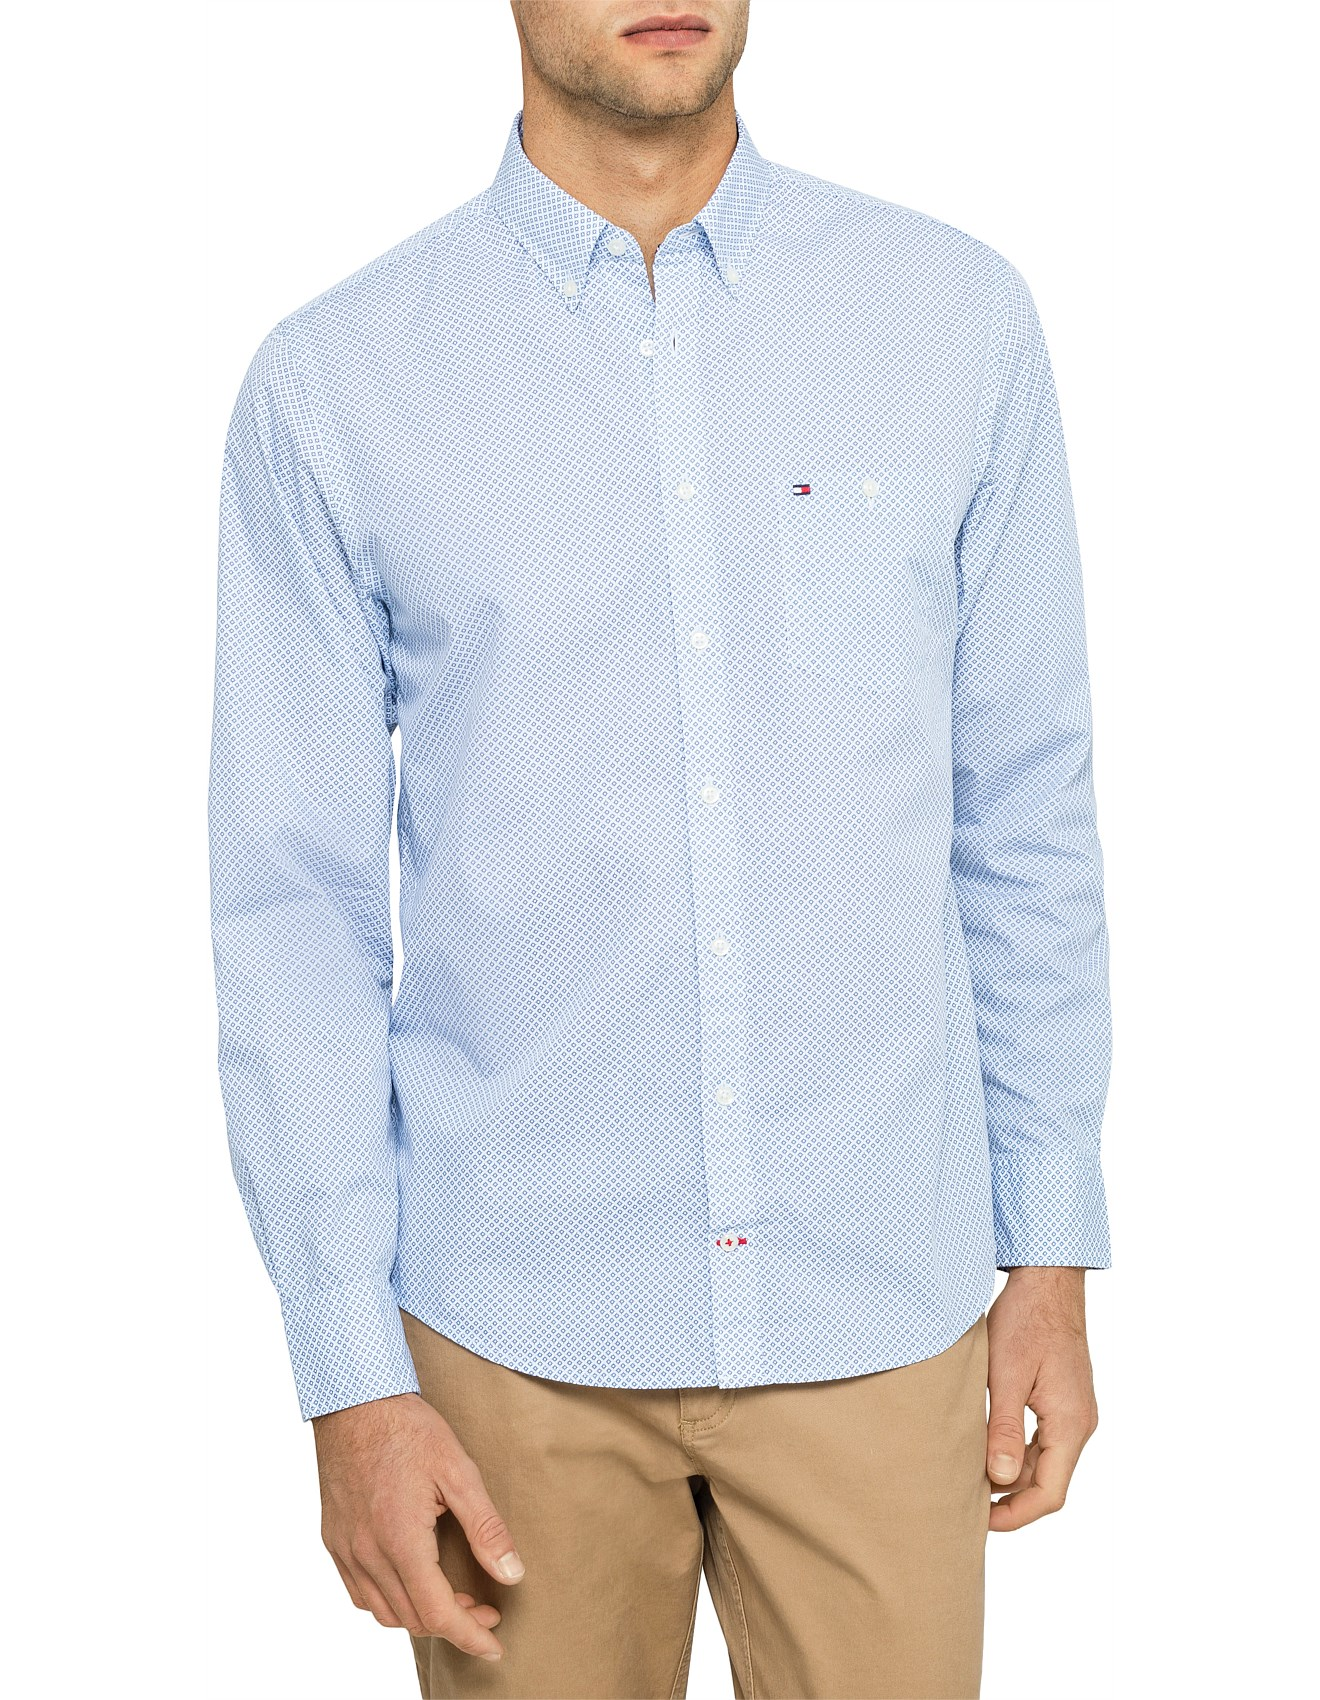 578491d2 Men's Casual Shirts | Buy Casual Shirts Online | David Jones - NAVAJO GEO  PRINTED SHIRT